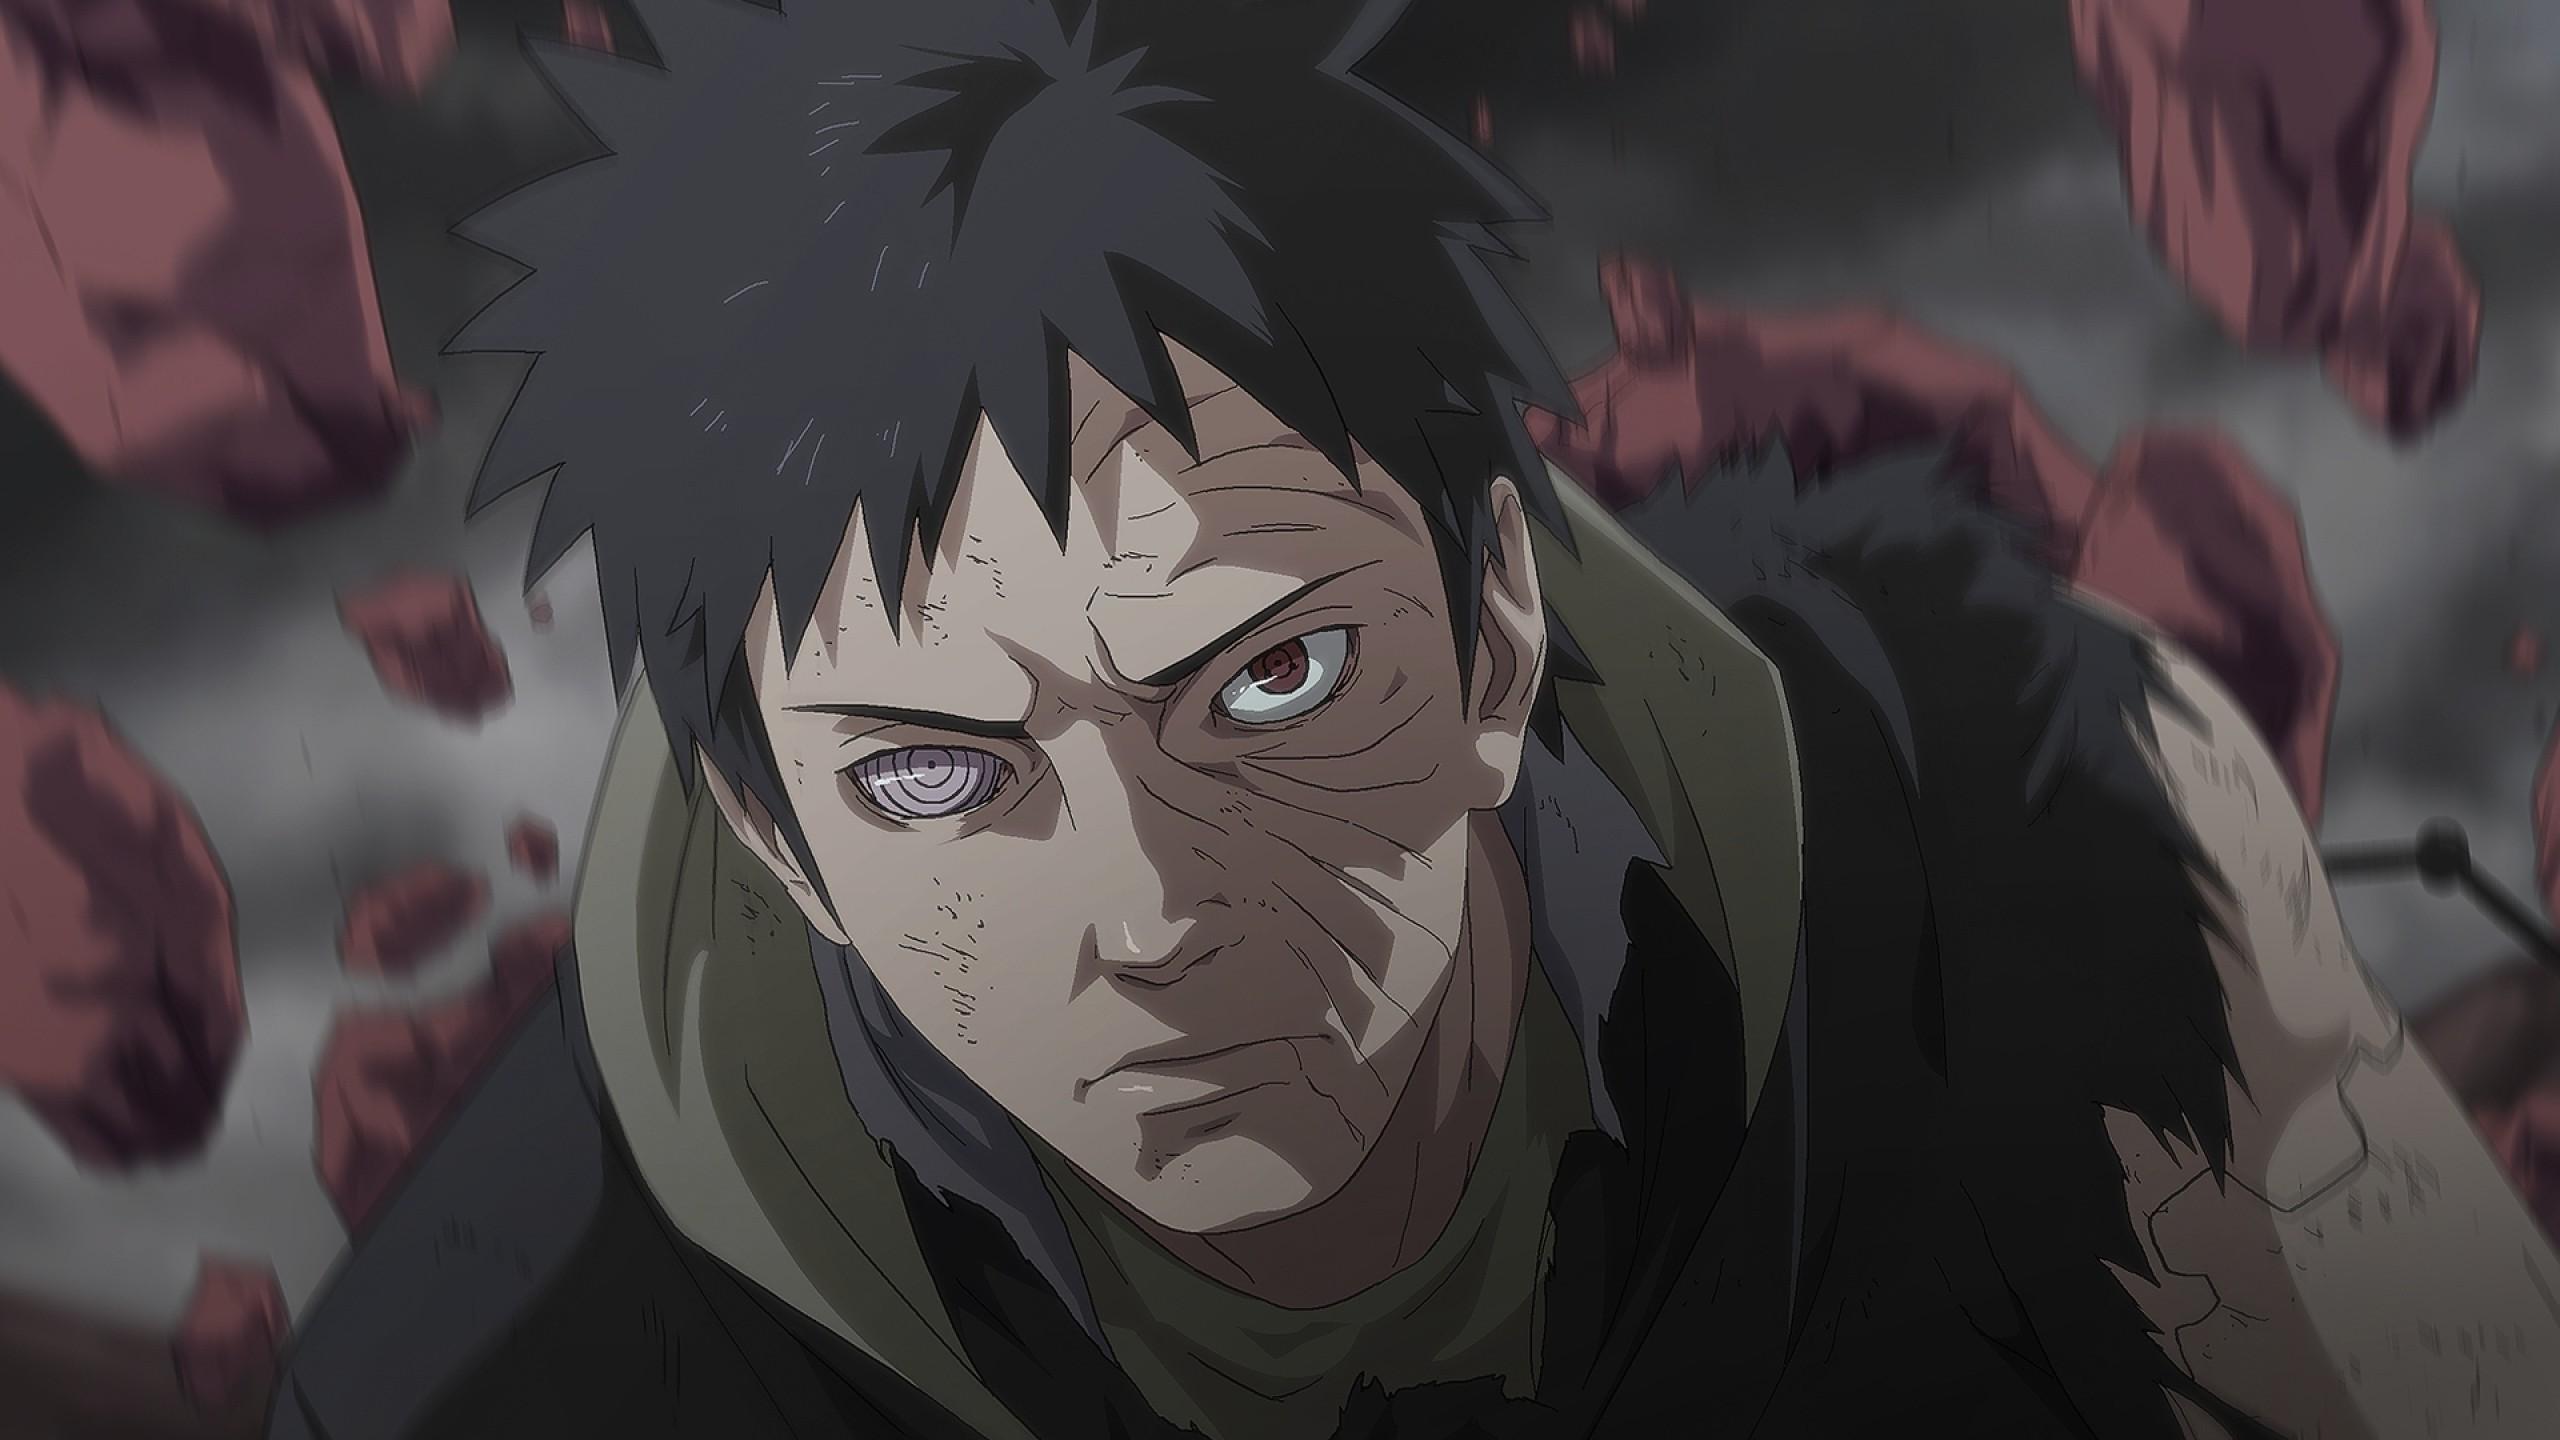 … Obito Uchiha – Naruto HD Wallpaper 2560×1440